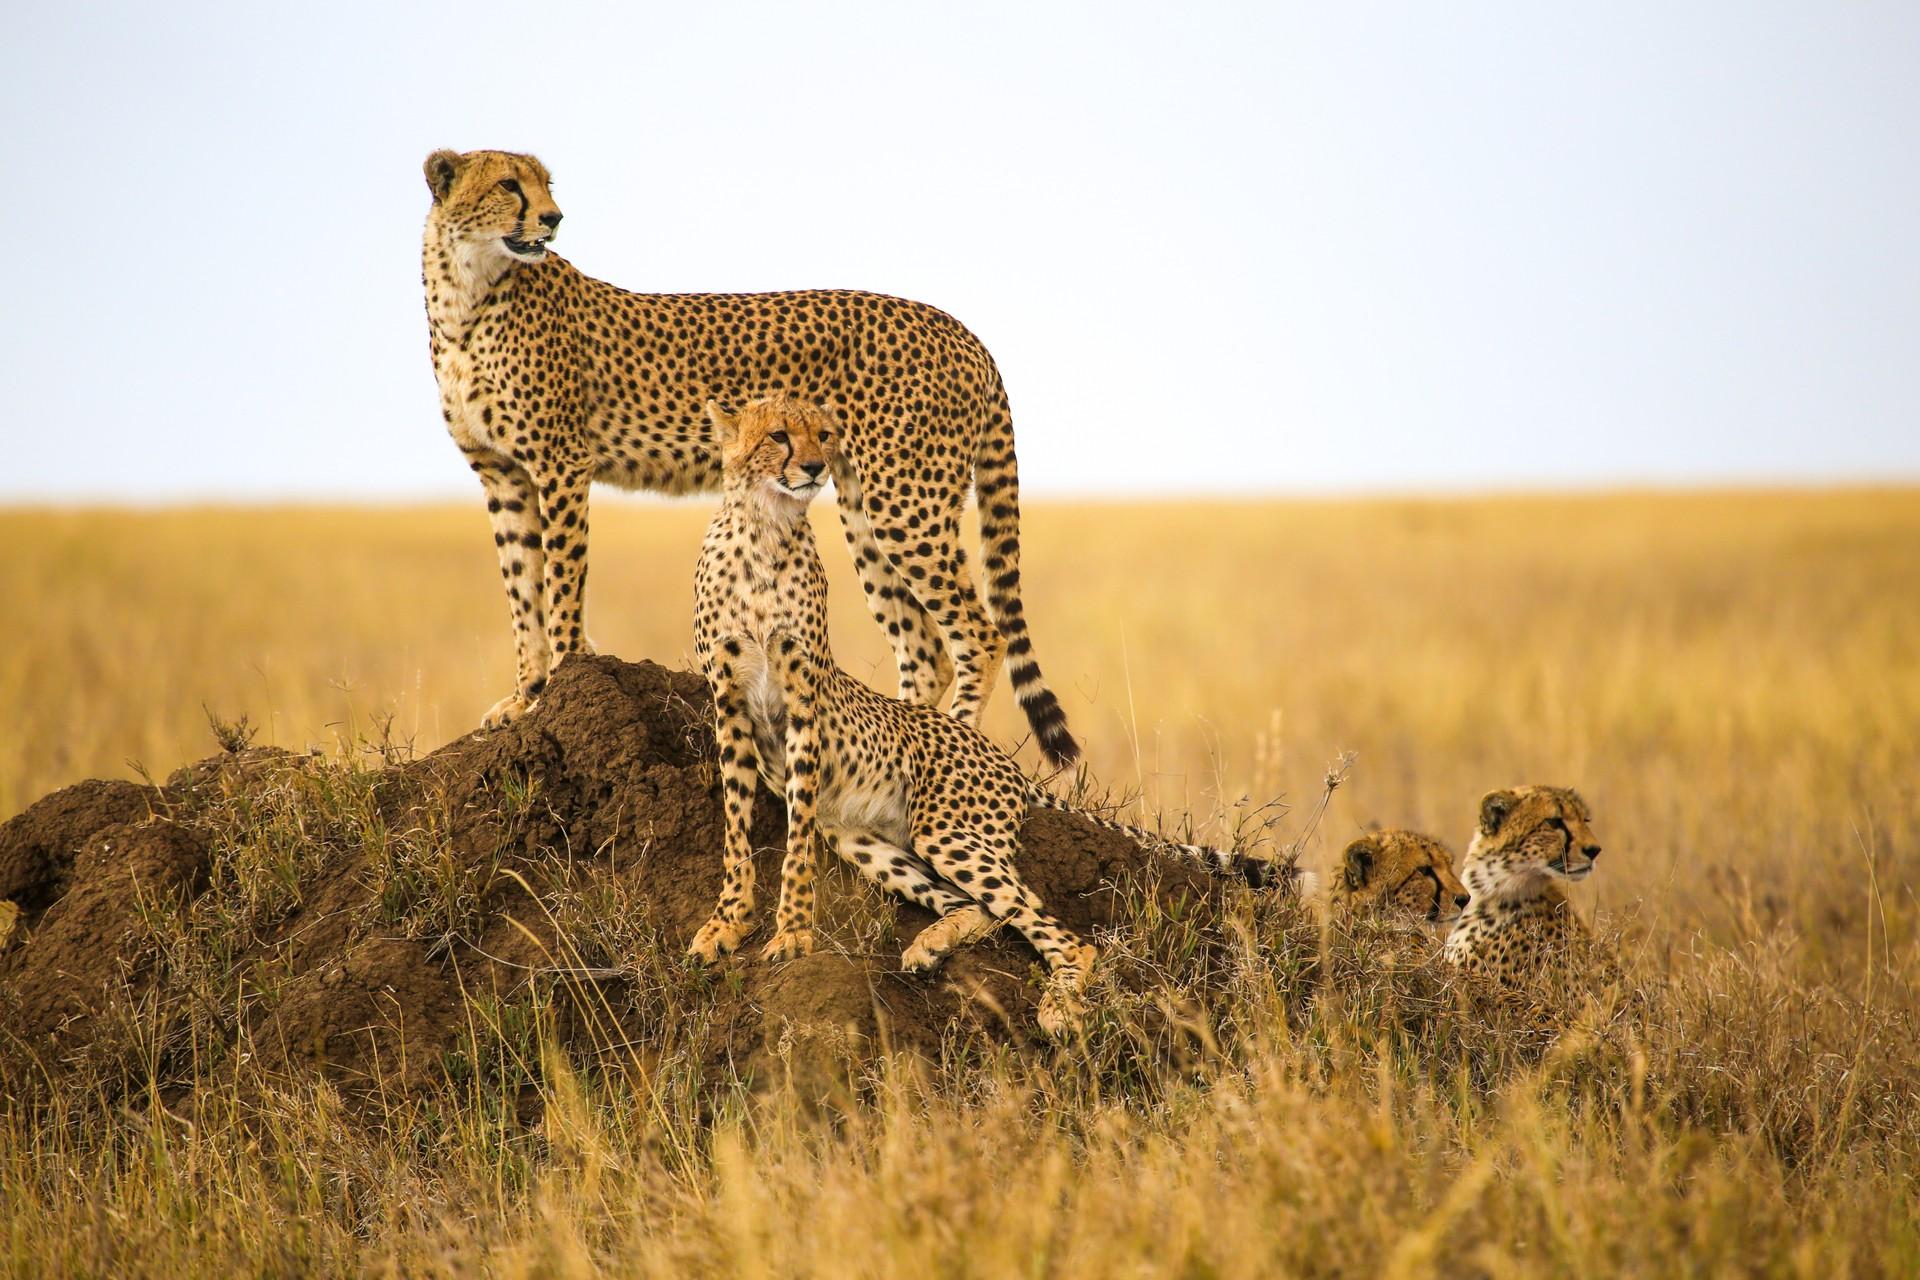 cheetah family in the Serengeti, Tanzania